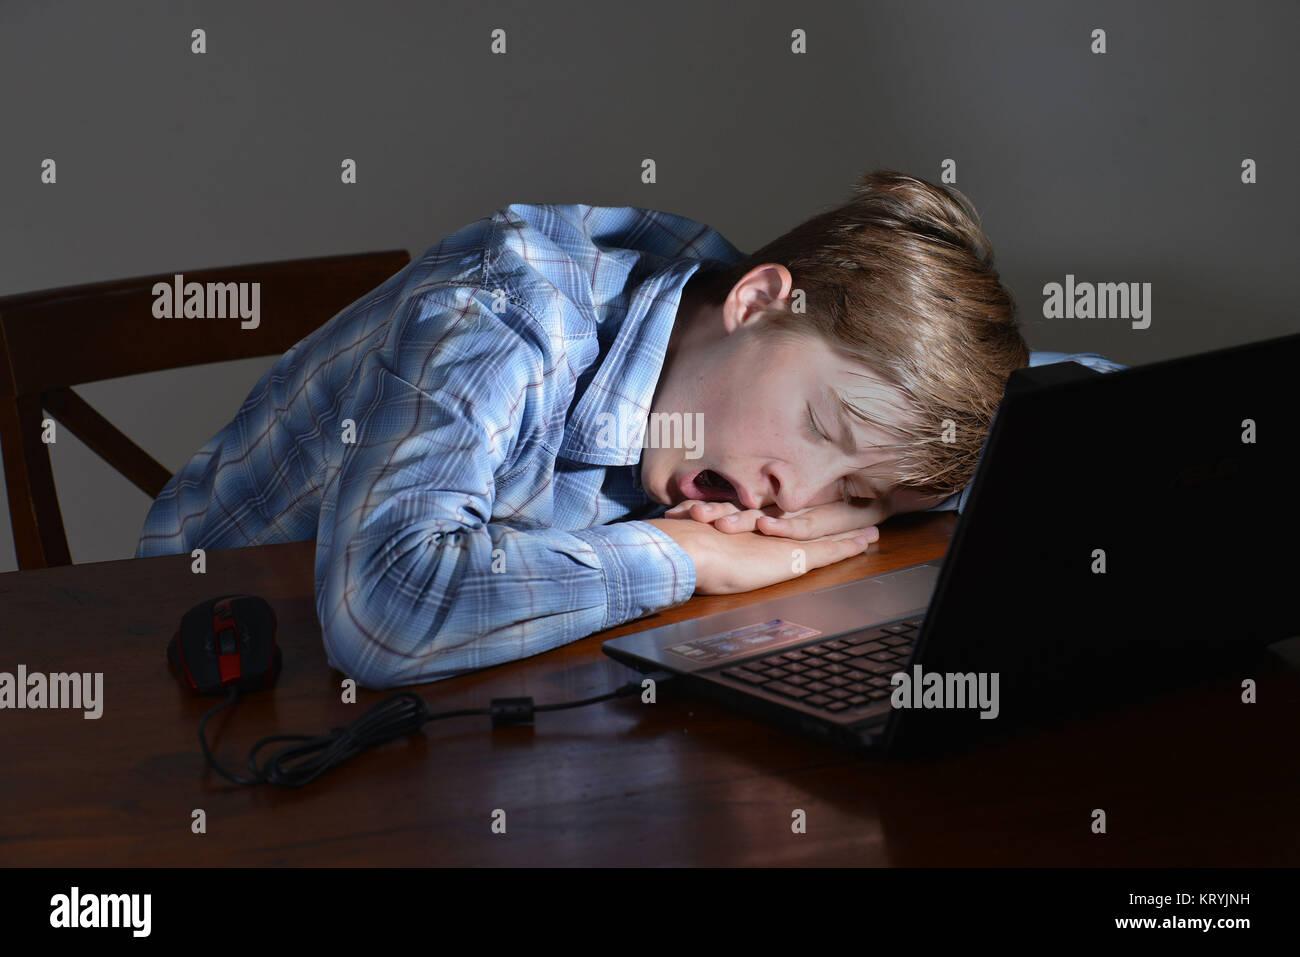 Youngster, computer, sleep, Jugendlicher, Computer, Schlaf - Stock Image